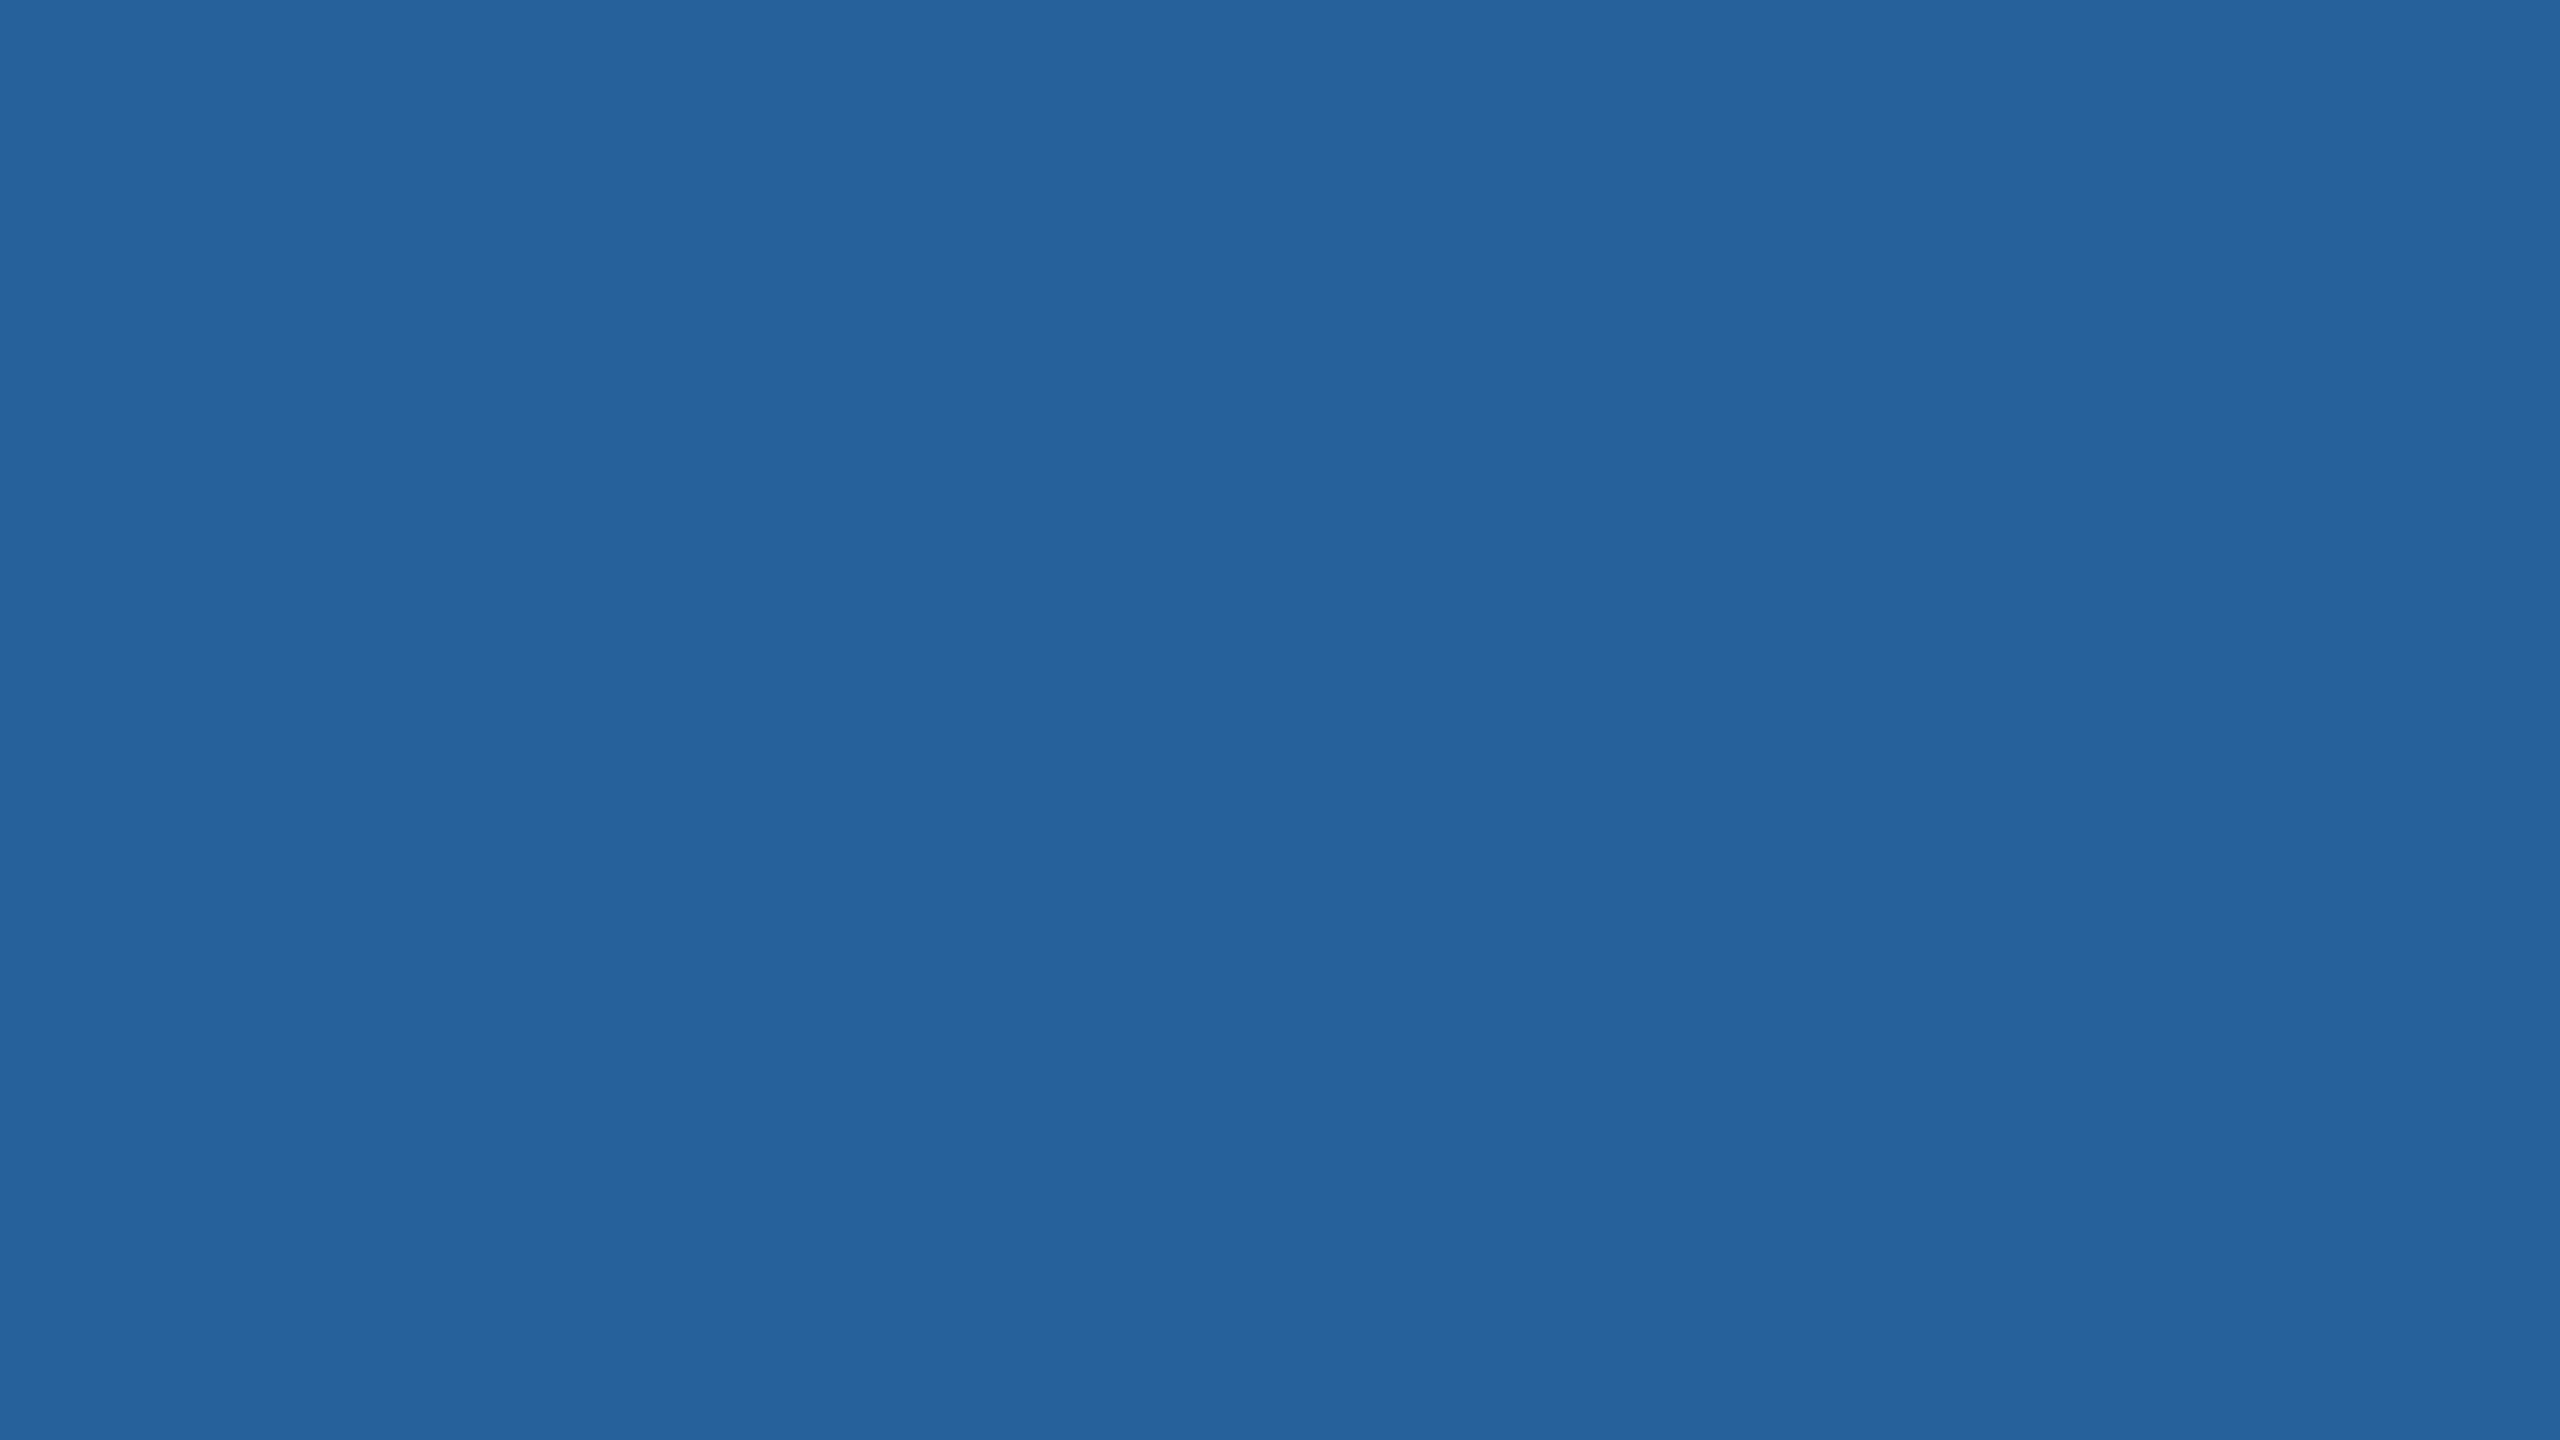 2560x1440 Lapis Lazuli Solid Color Background